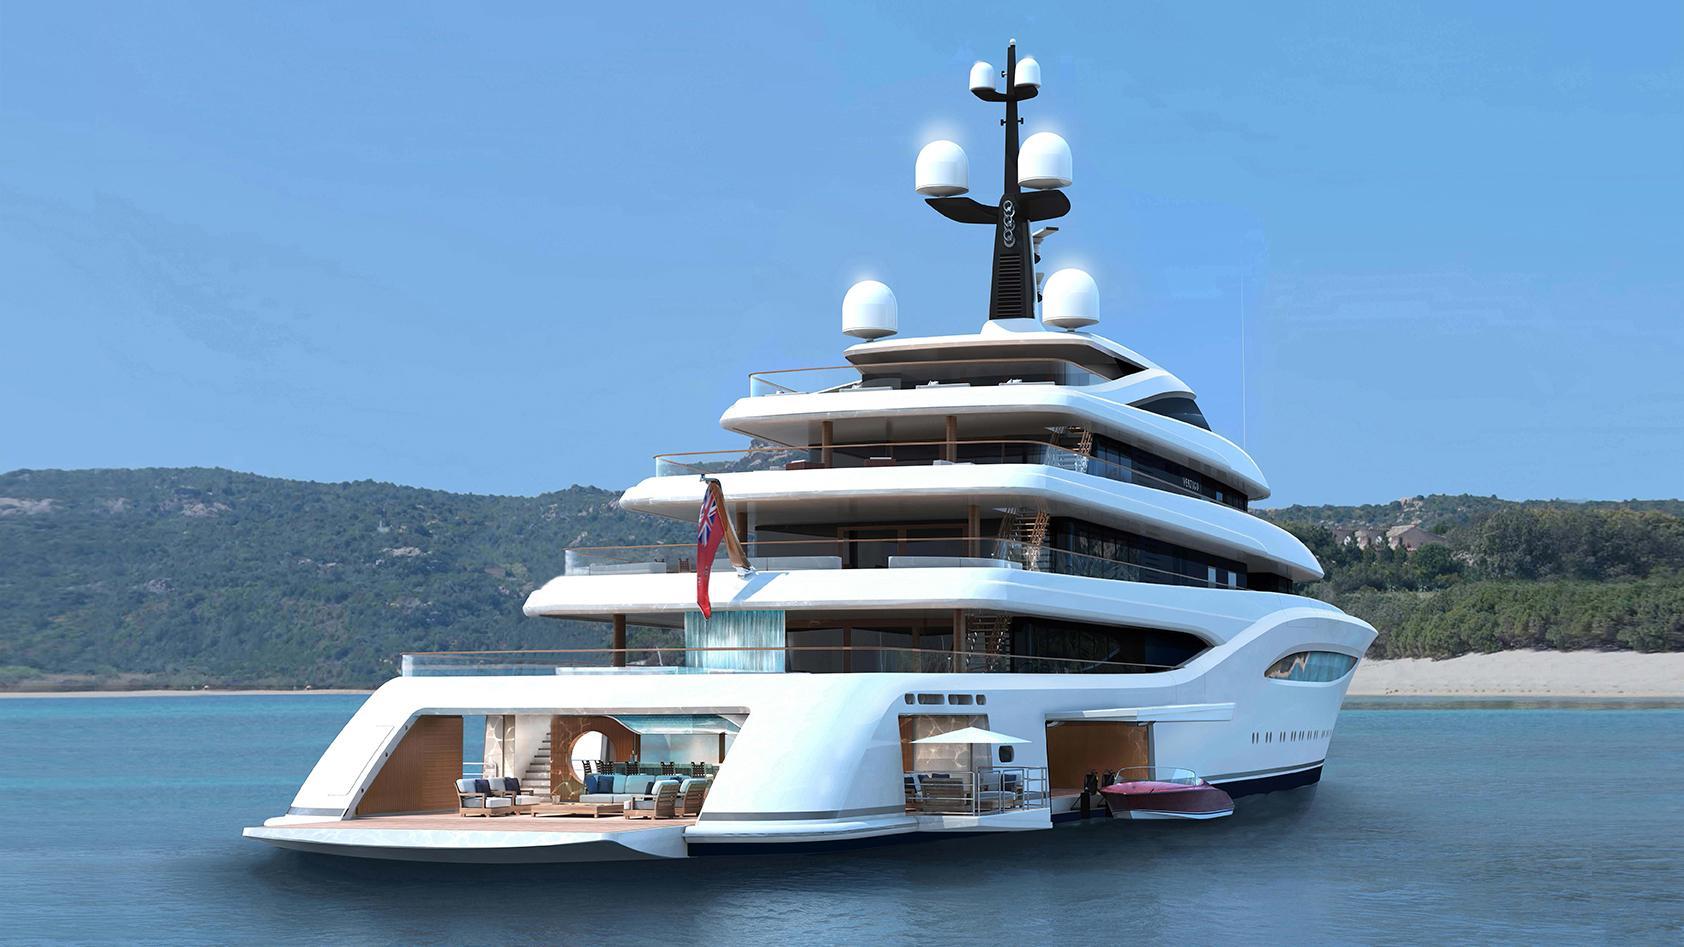 vertigo motoryacht feadship 2017 97m rendering stern